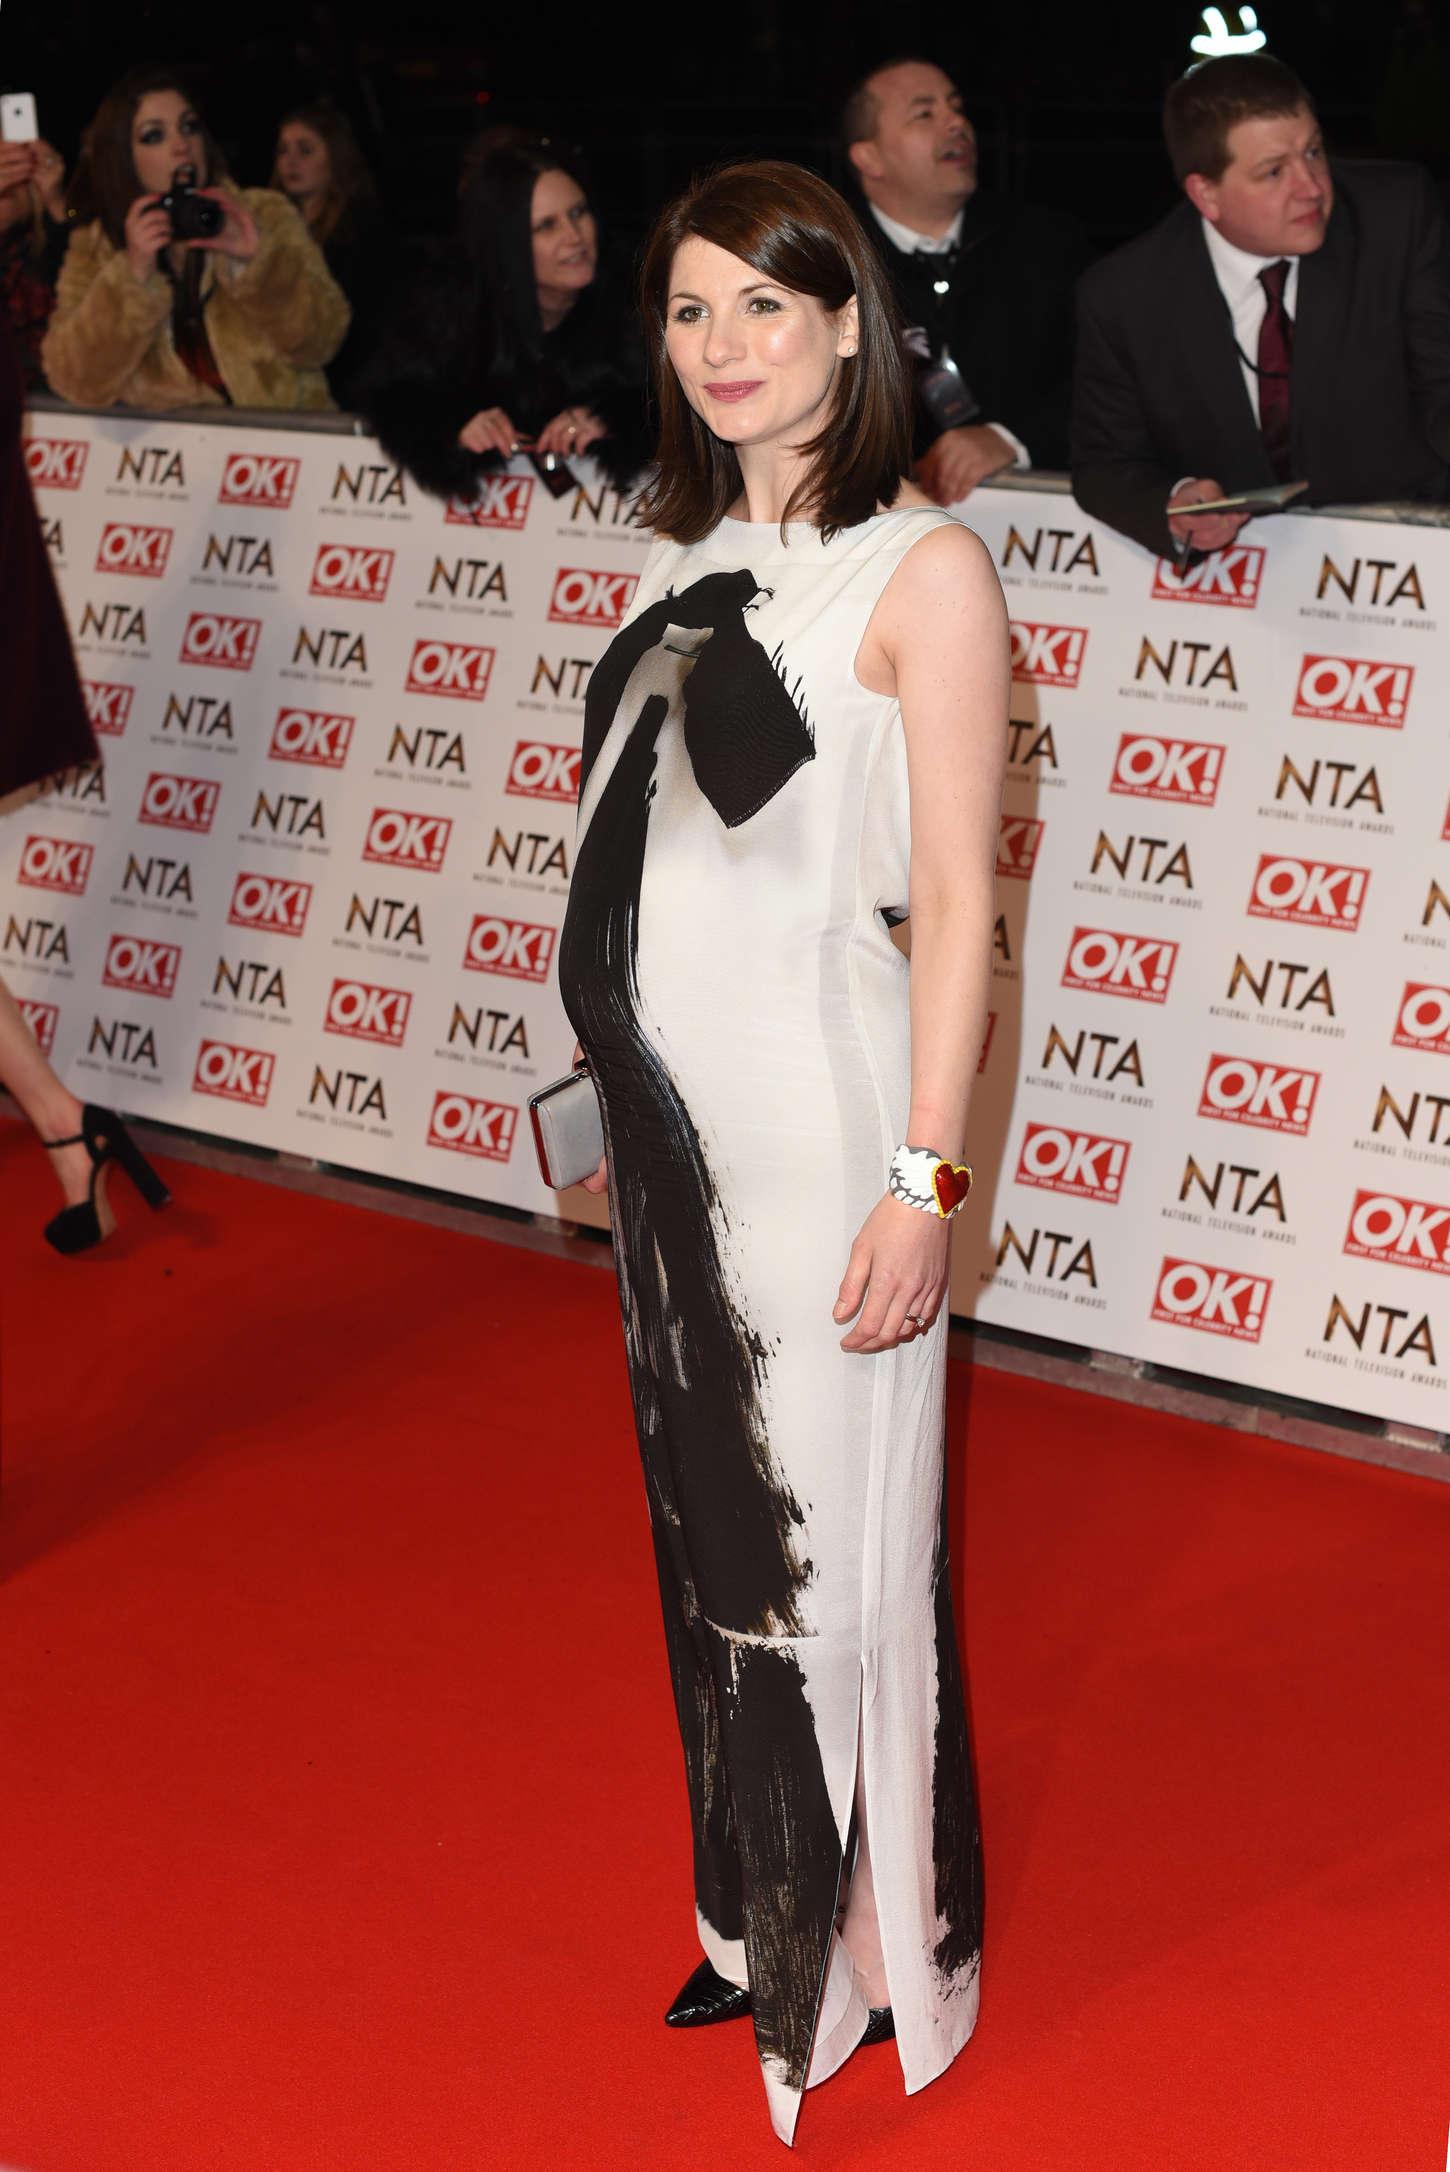 Jodie Whittaker awards